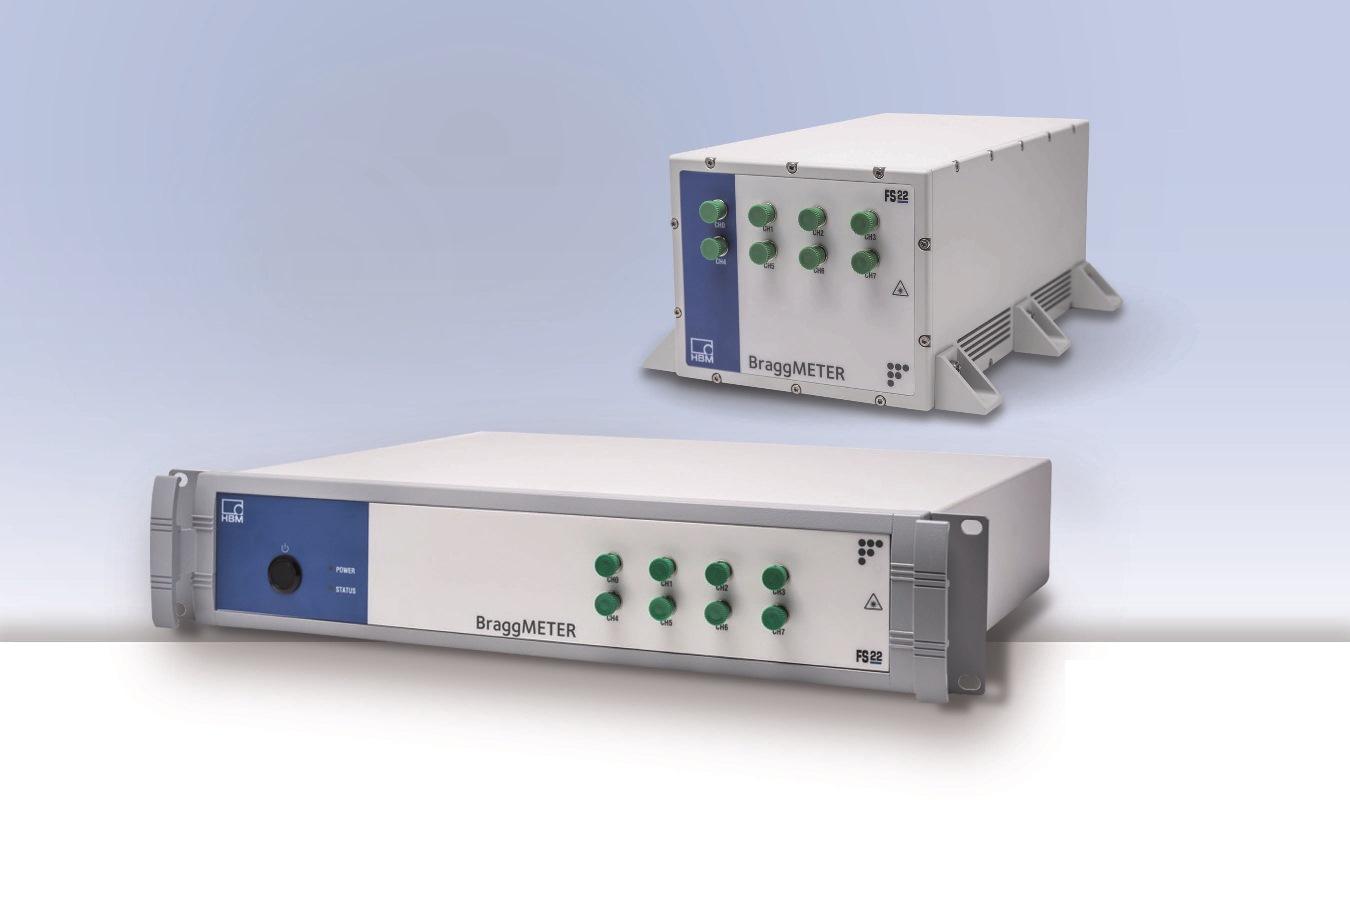 Industrial BraggMETER optical measurement unit